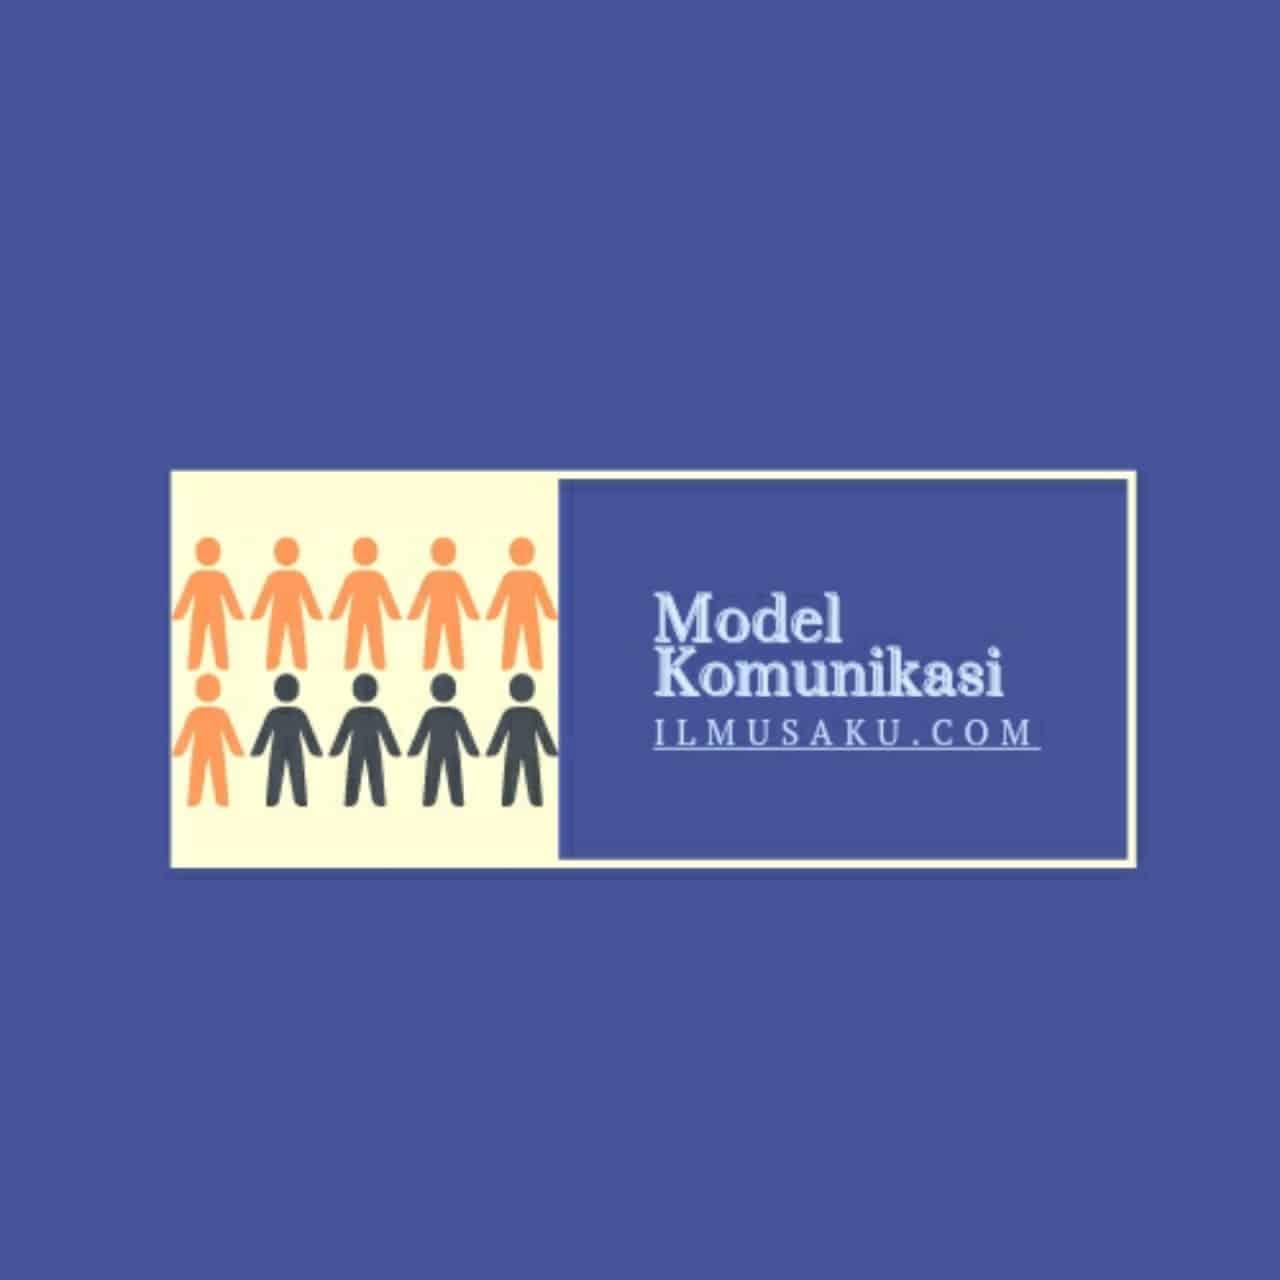 Pengertian model komunikasi